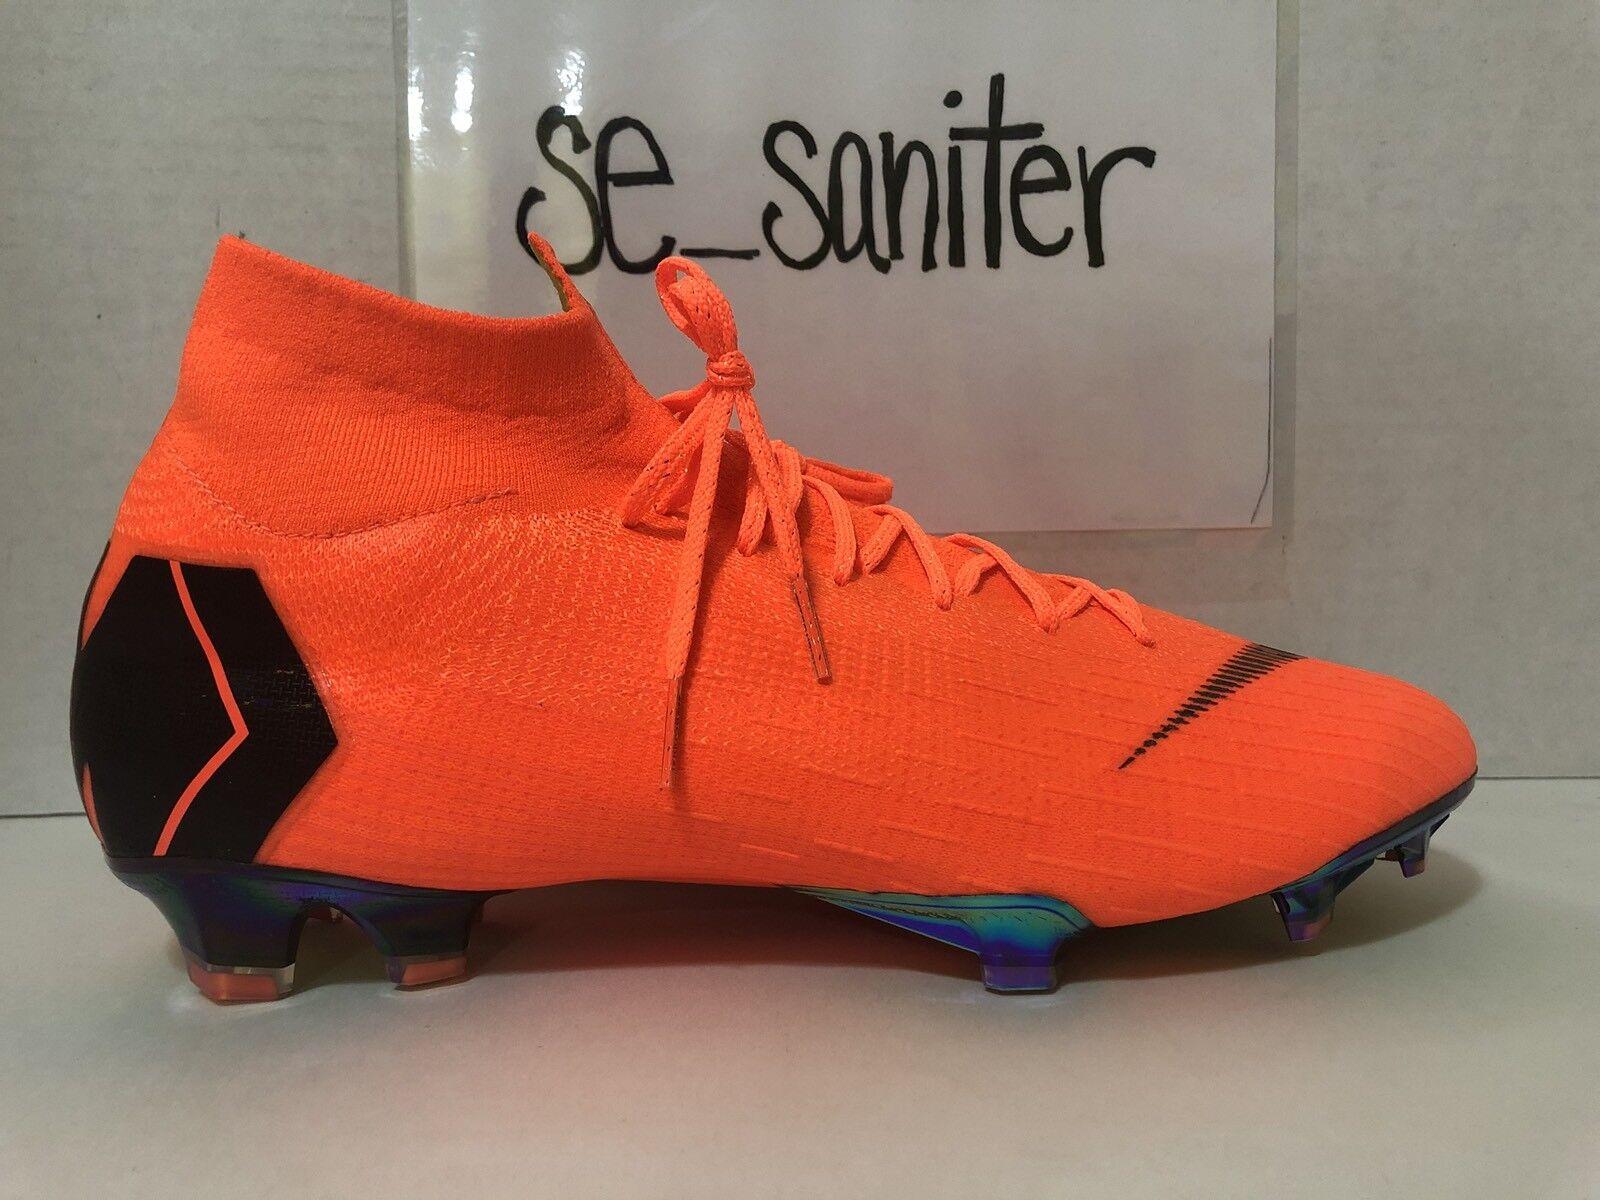 Men's Nike Superfly 6 Elite FG Total Orange Black Cleats AH7365 810 Size 12